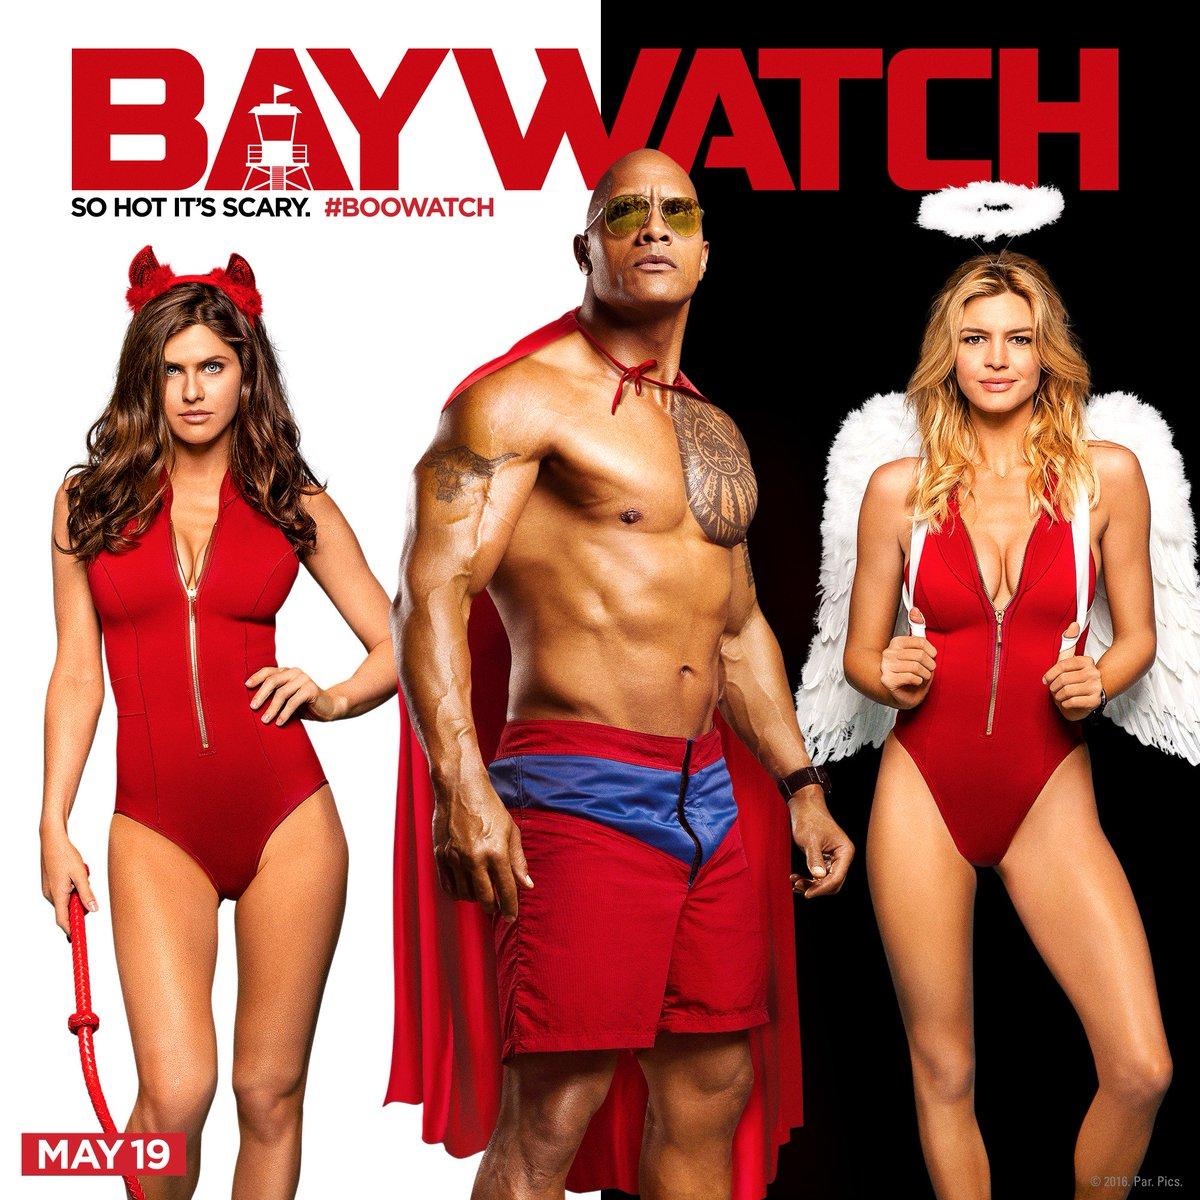 Baywatch Trailer Teaser Revealed 4